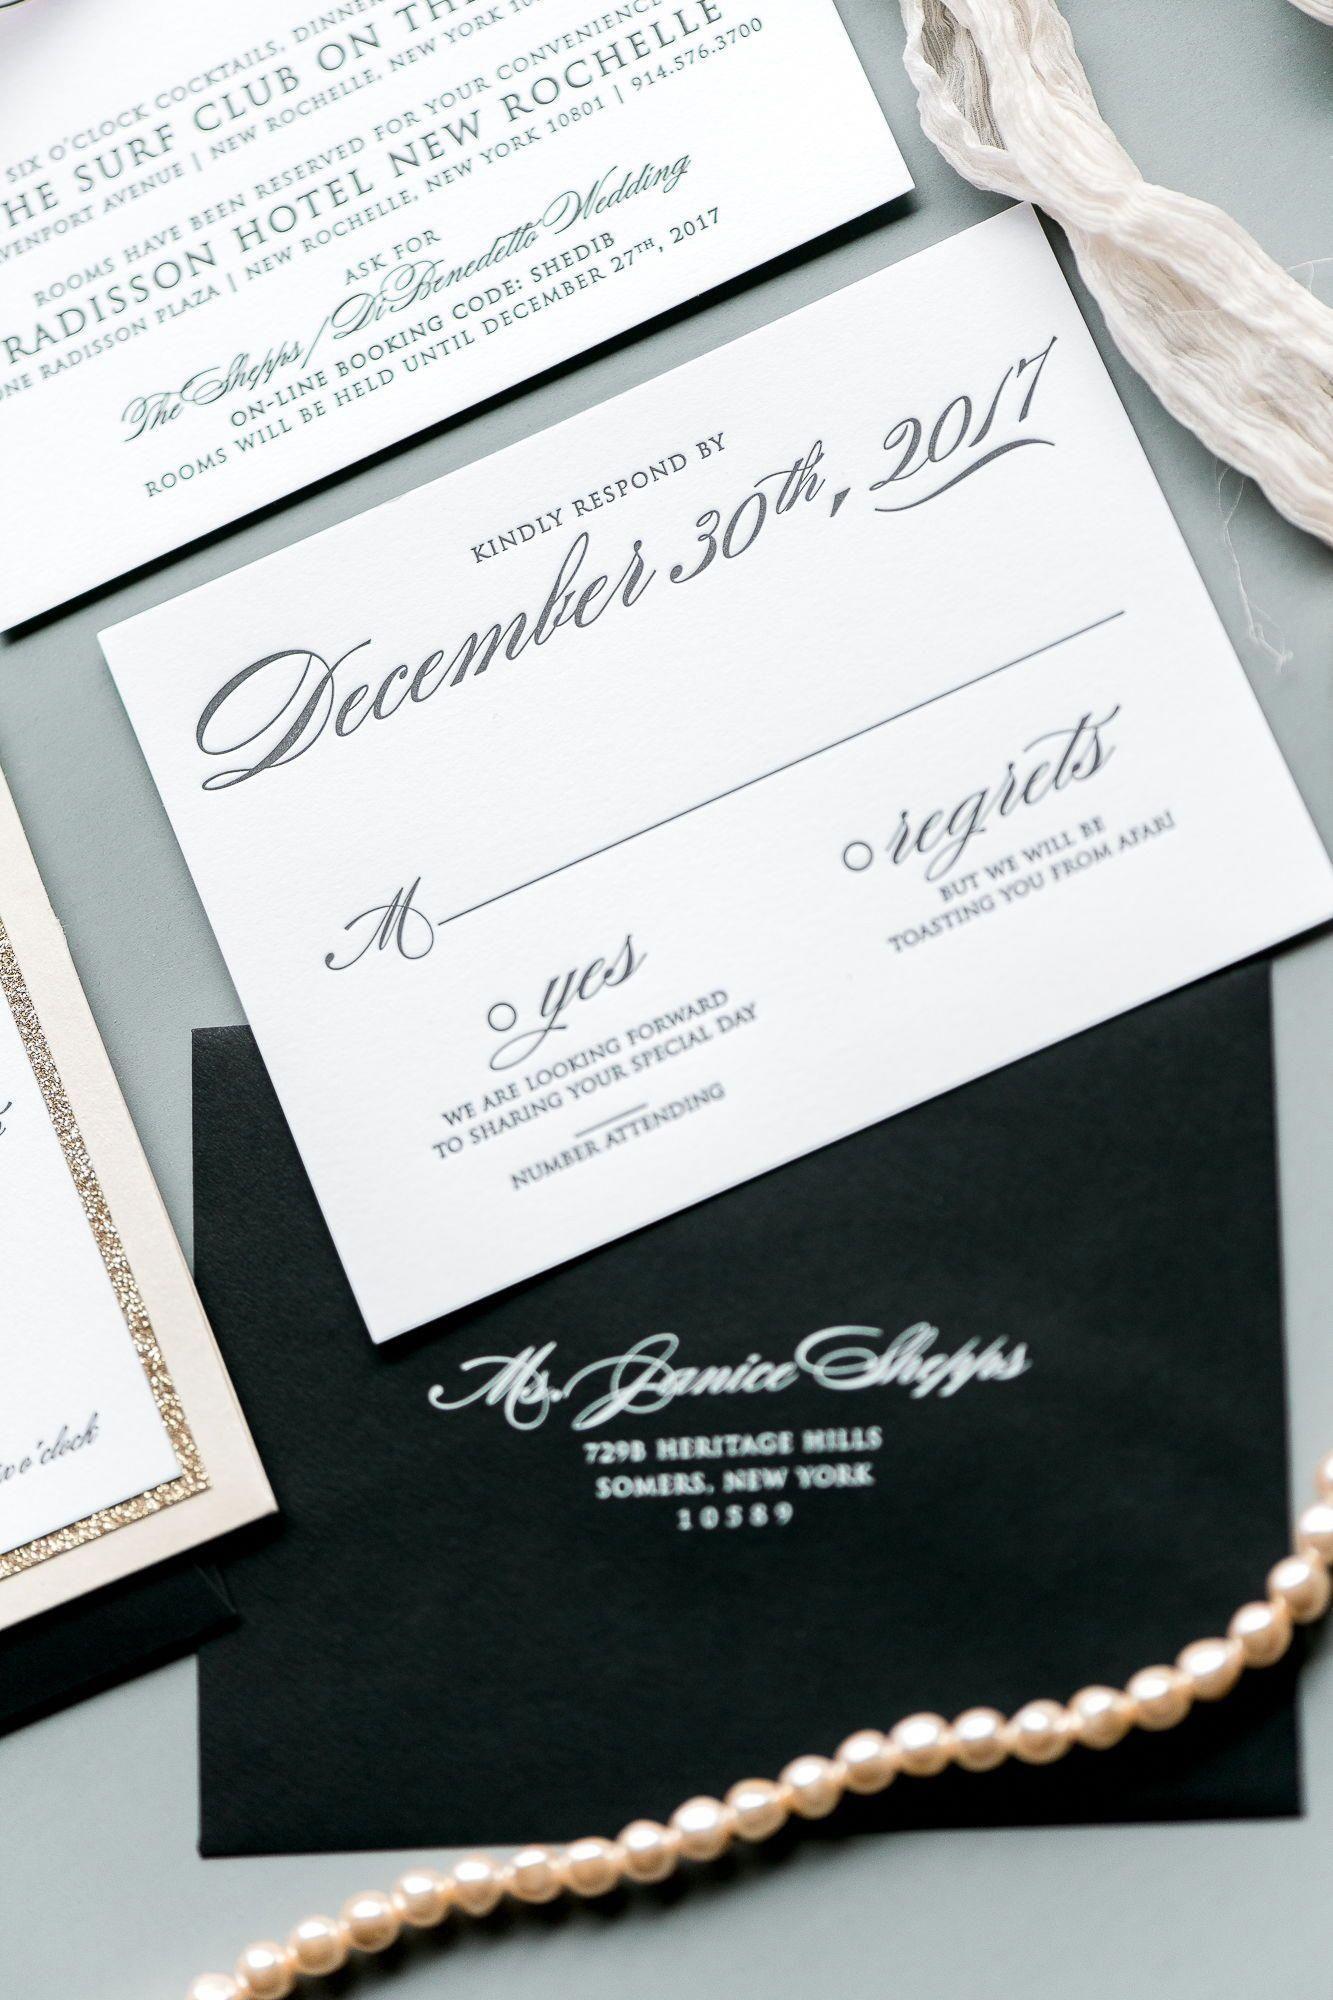 Cheapest Wedding Venues In Ma Wedding50guestsbudget Id 4135723906 Unique Wedding Invitation Wording Buy Wedding Invitations Letterpress Wedding Invitations